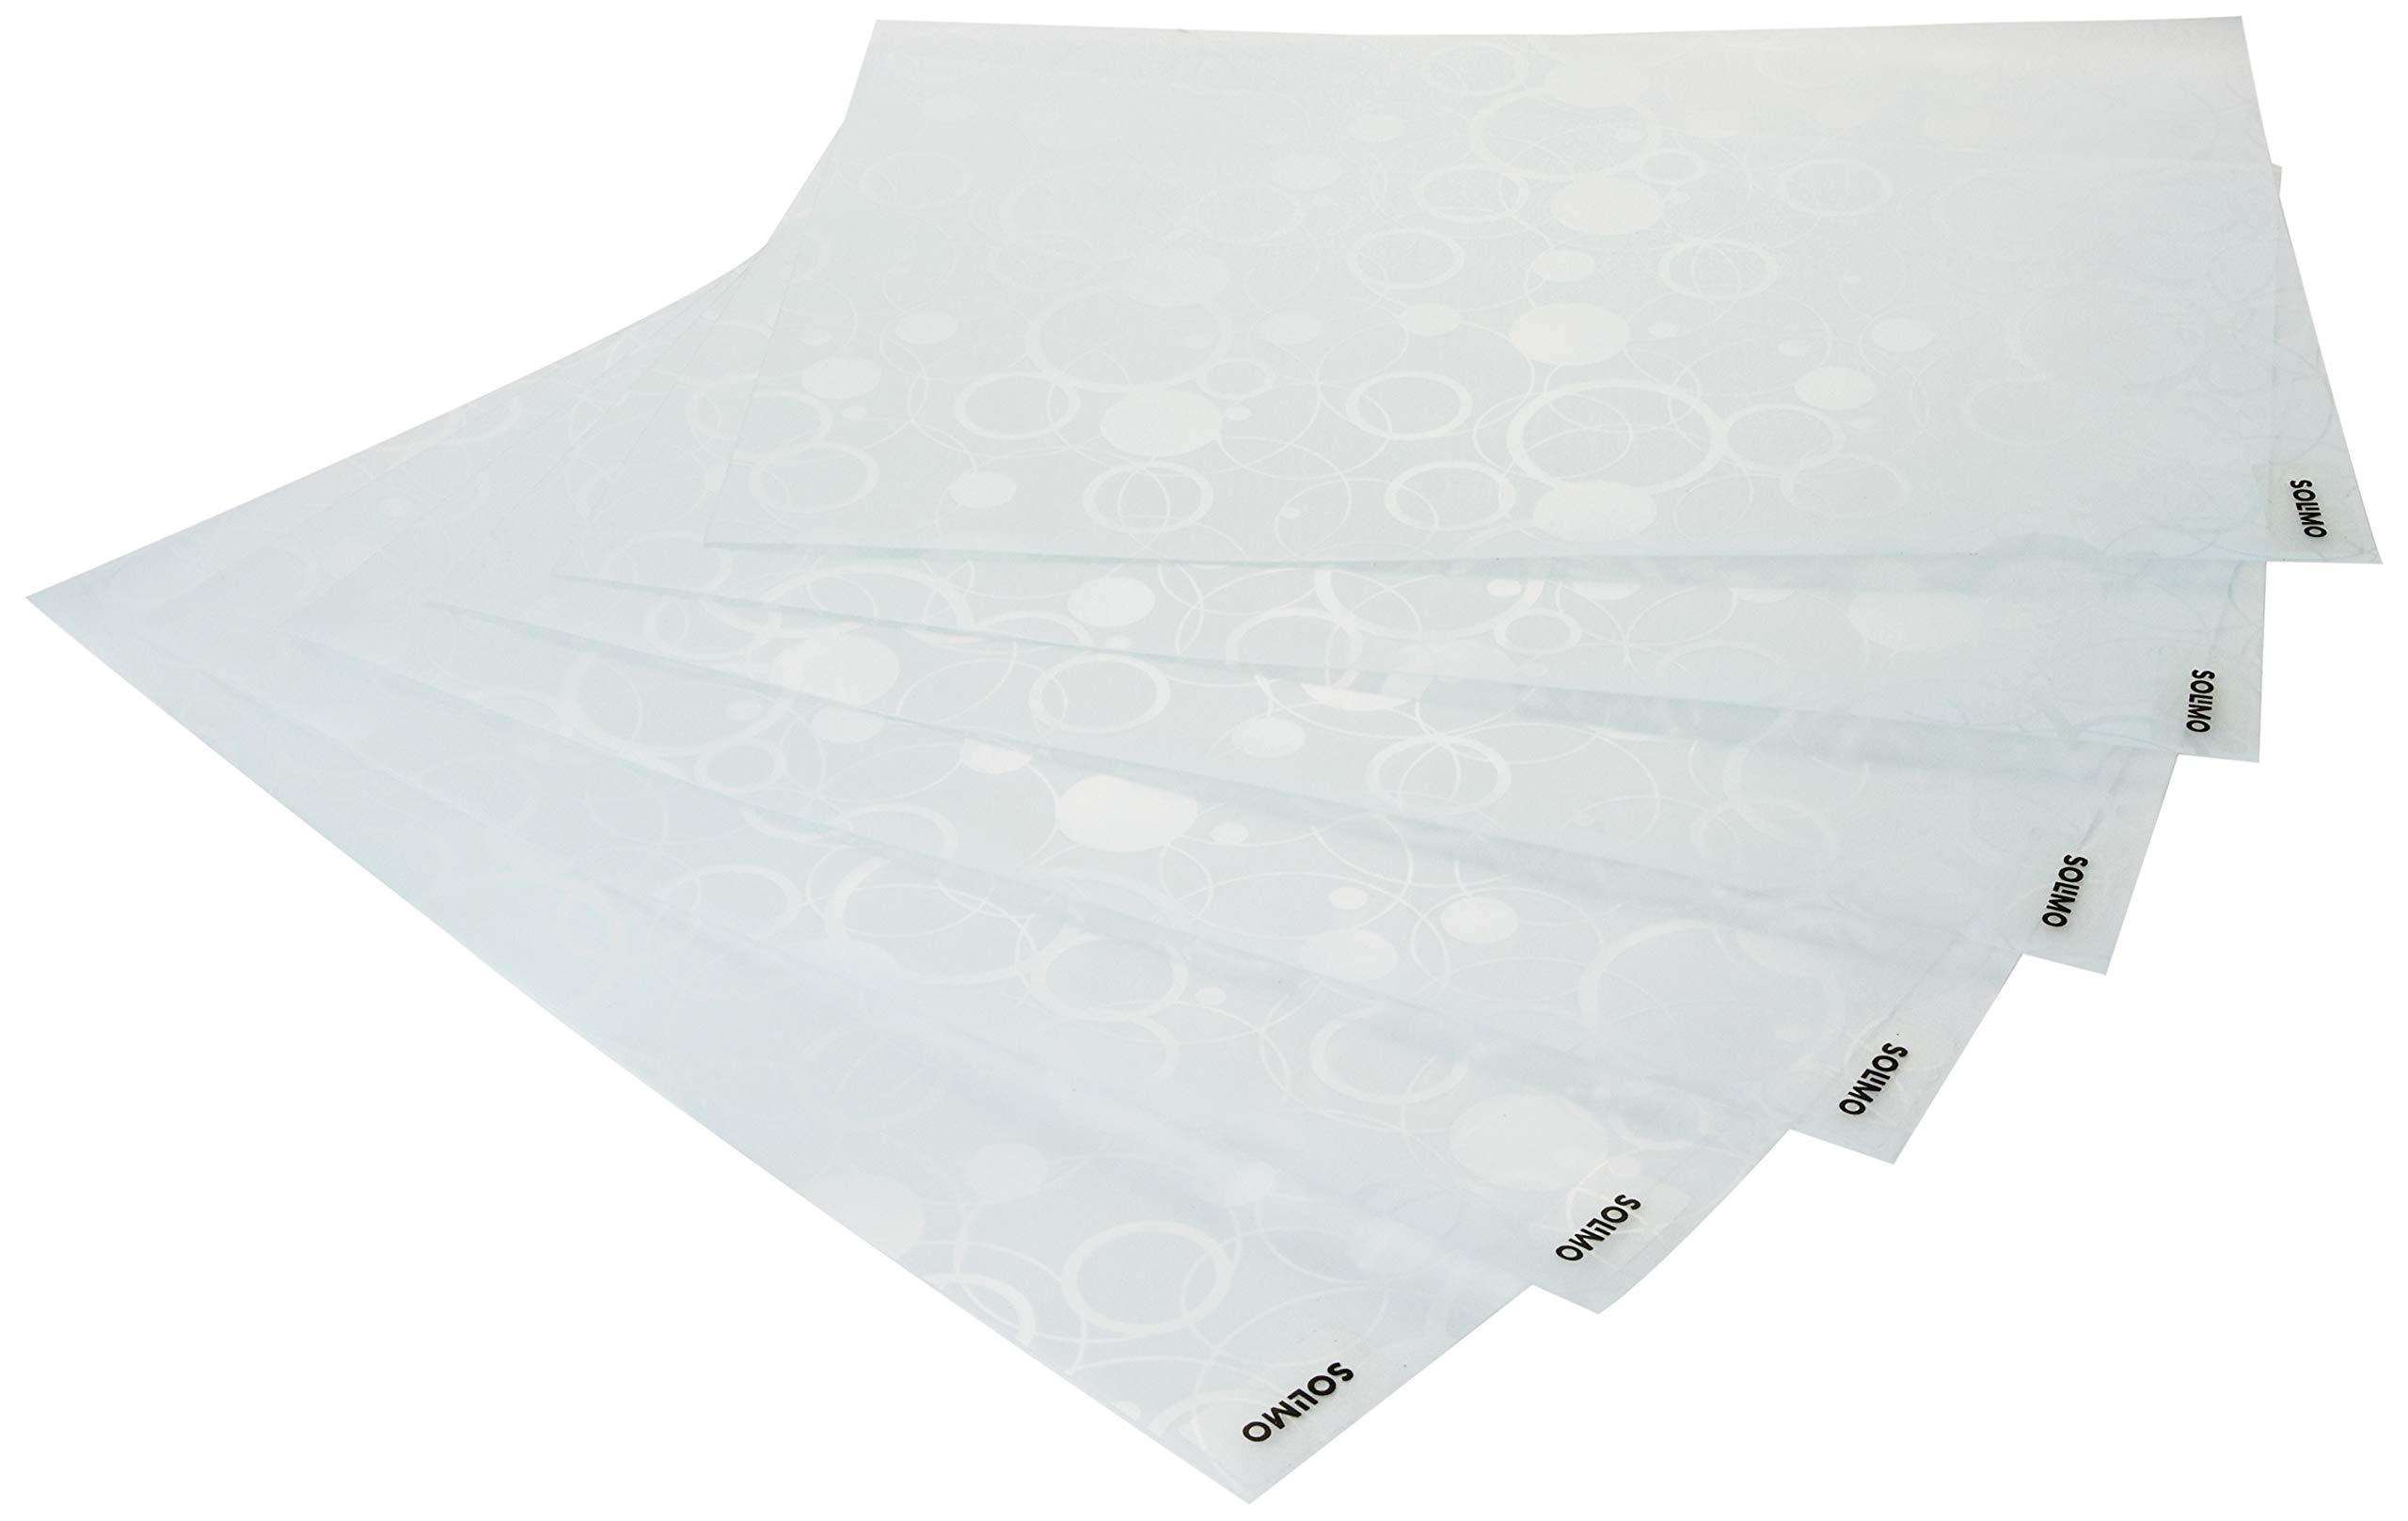 Amazon Brand - Solimo PVC Fridge Multipurpose Mat, Circles, Set of 6, White (B07QSBC78Y) Amazon Price History, Amazon Price Tracker